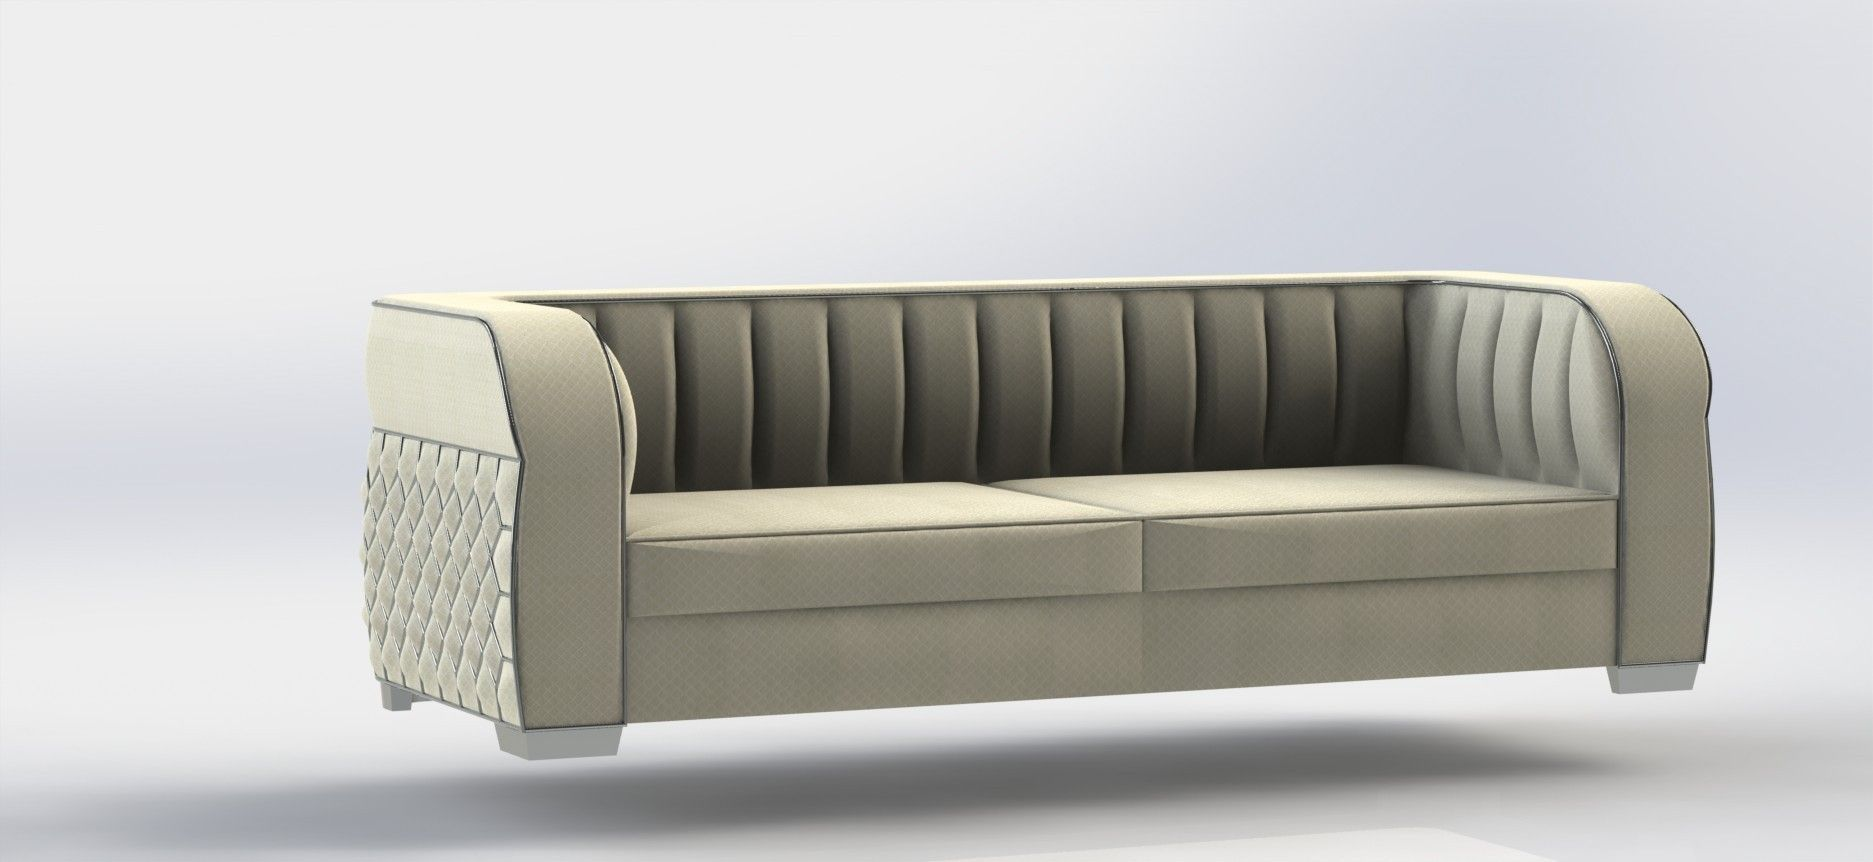 ... Art Deco Sofa 3d Model Stl Dwg Sldprt Sldasm Slddrw Ige Igs Iges 3 ...